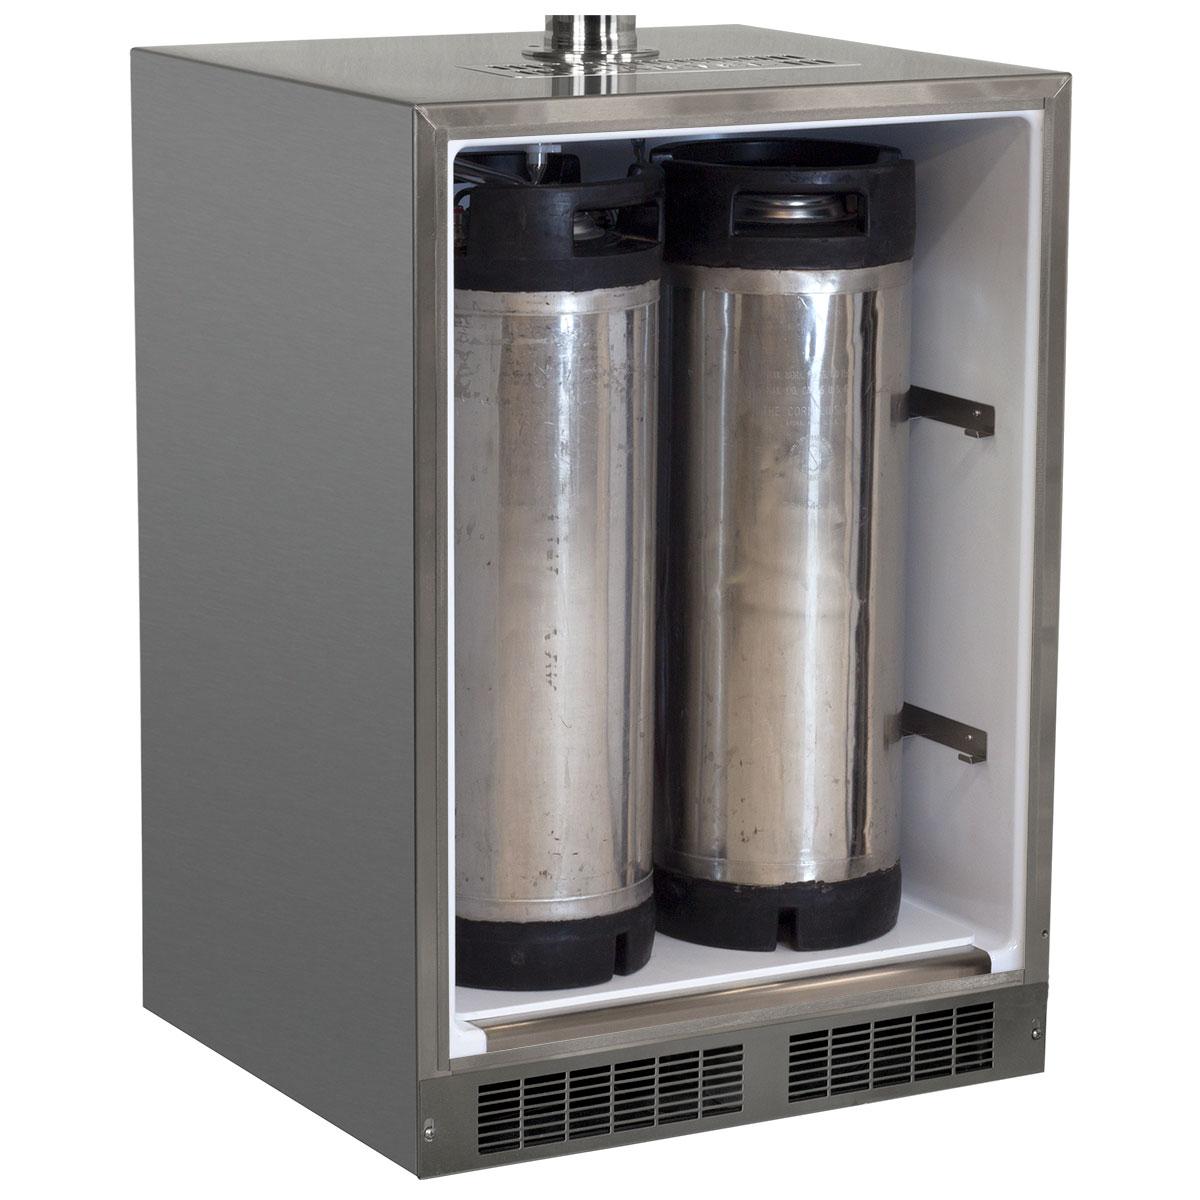 "Model: MO24BSSMRS   Marvel  24"" Outdoor Single Tap Mobile Beer Dispenser with Stainless Steel Door"